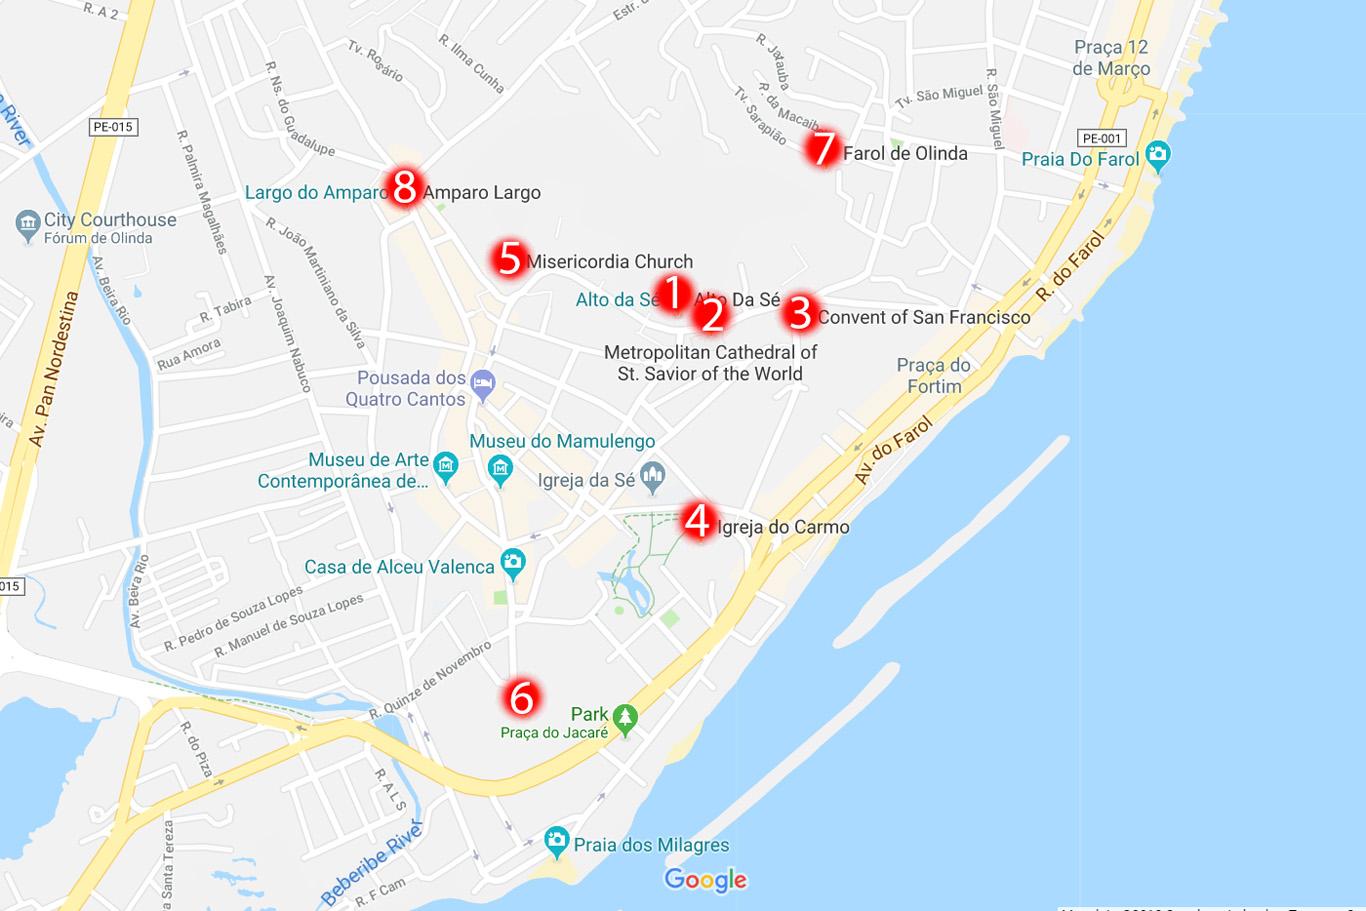 1. Alto Da Se - the viewpoint platform, 2. St. Savior of the World Church, 3. San Francisco Convent, 4. Church of Our Lady of Carmel, 5. Misericordia Church, 6. St. Benedict Monastery, 7. Farol de Olinda -the lighthouse, 8. Largo do Amparo - historical neighborhood